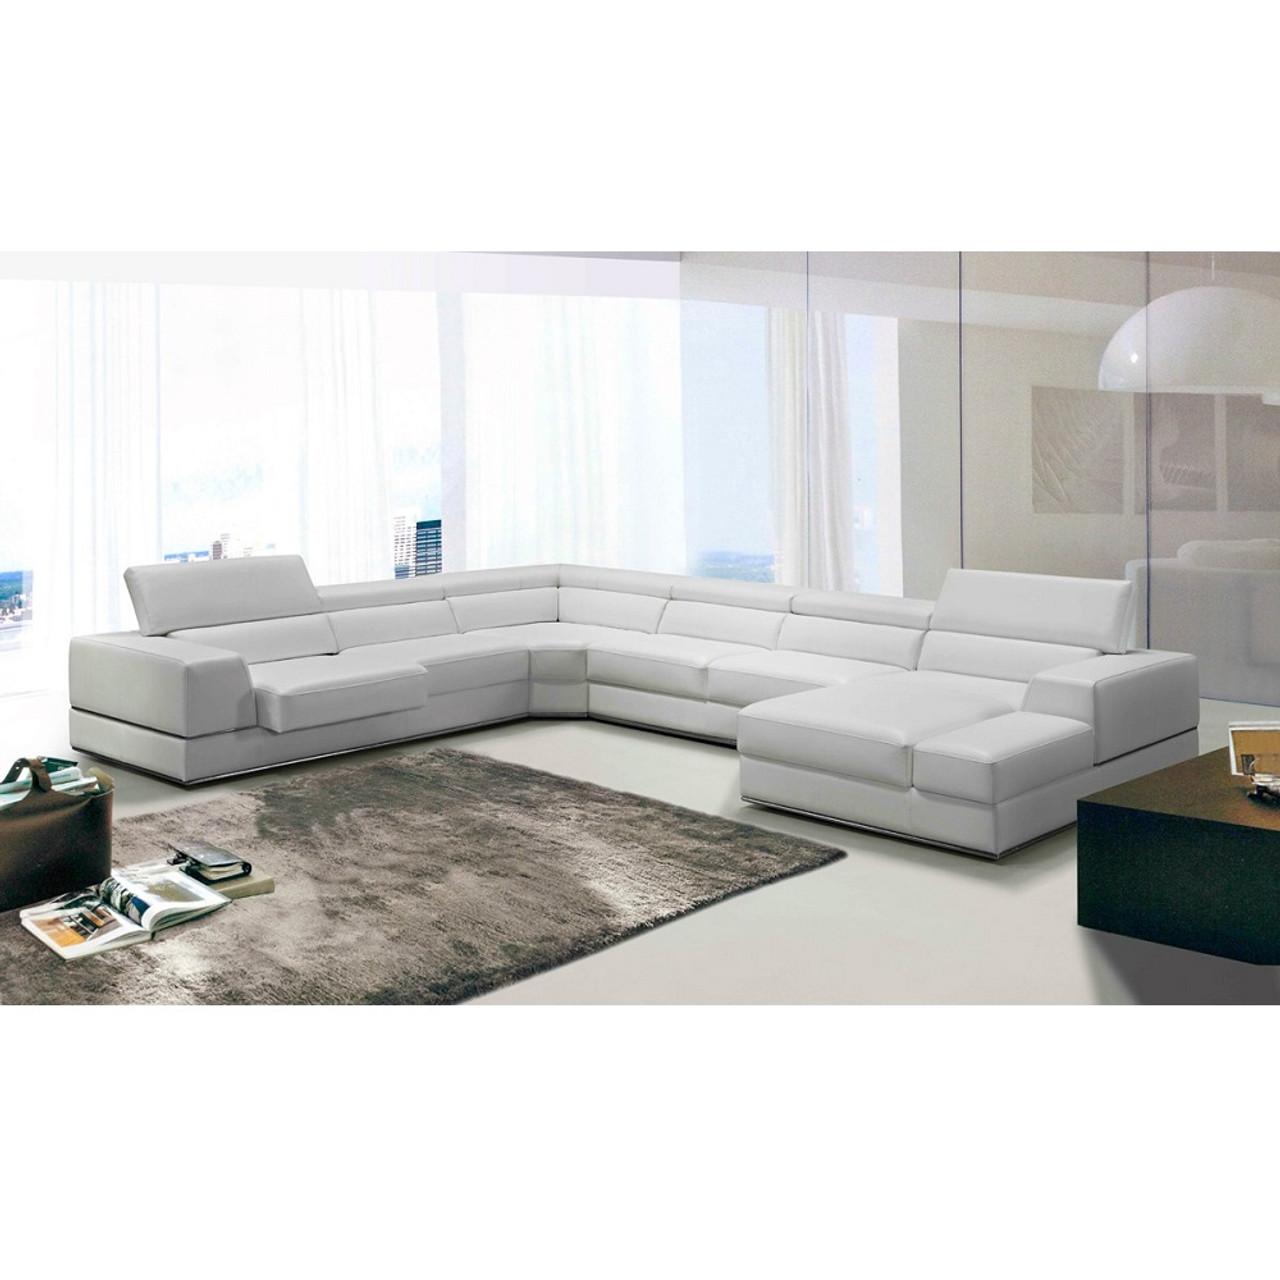 Divani Casa Pella Modern White Italian Leather Sectional Sofa